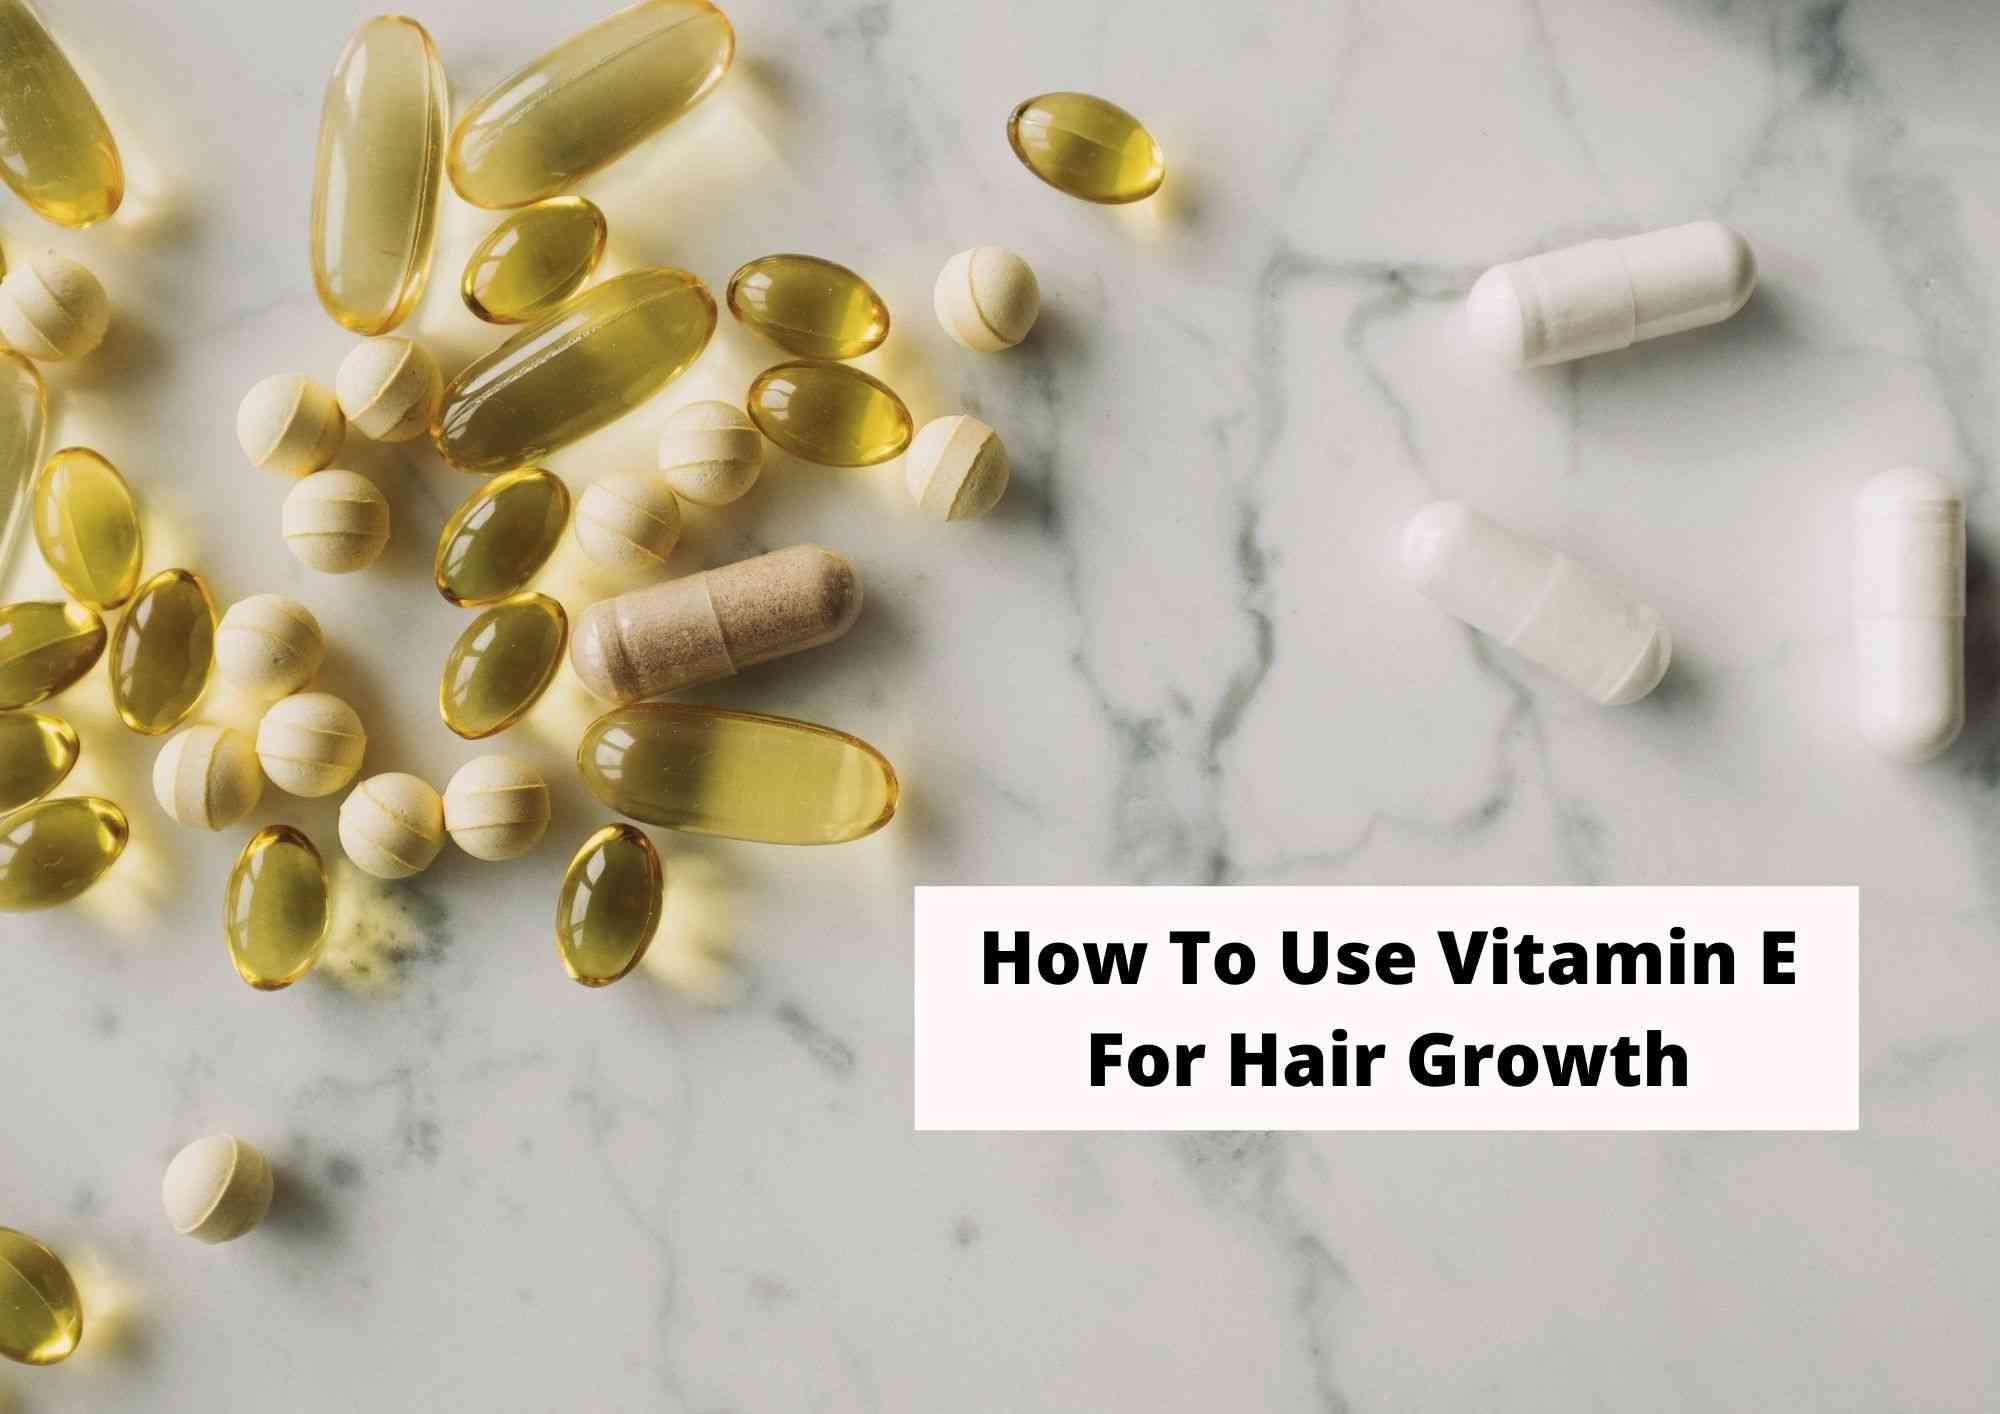 How Do You Use Vitamin E for Hair Growth